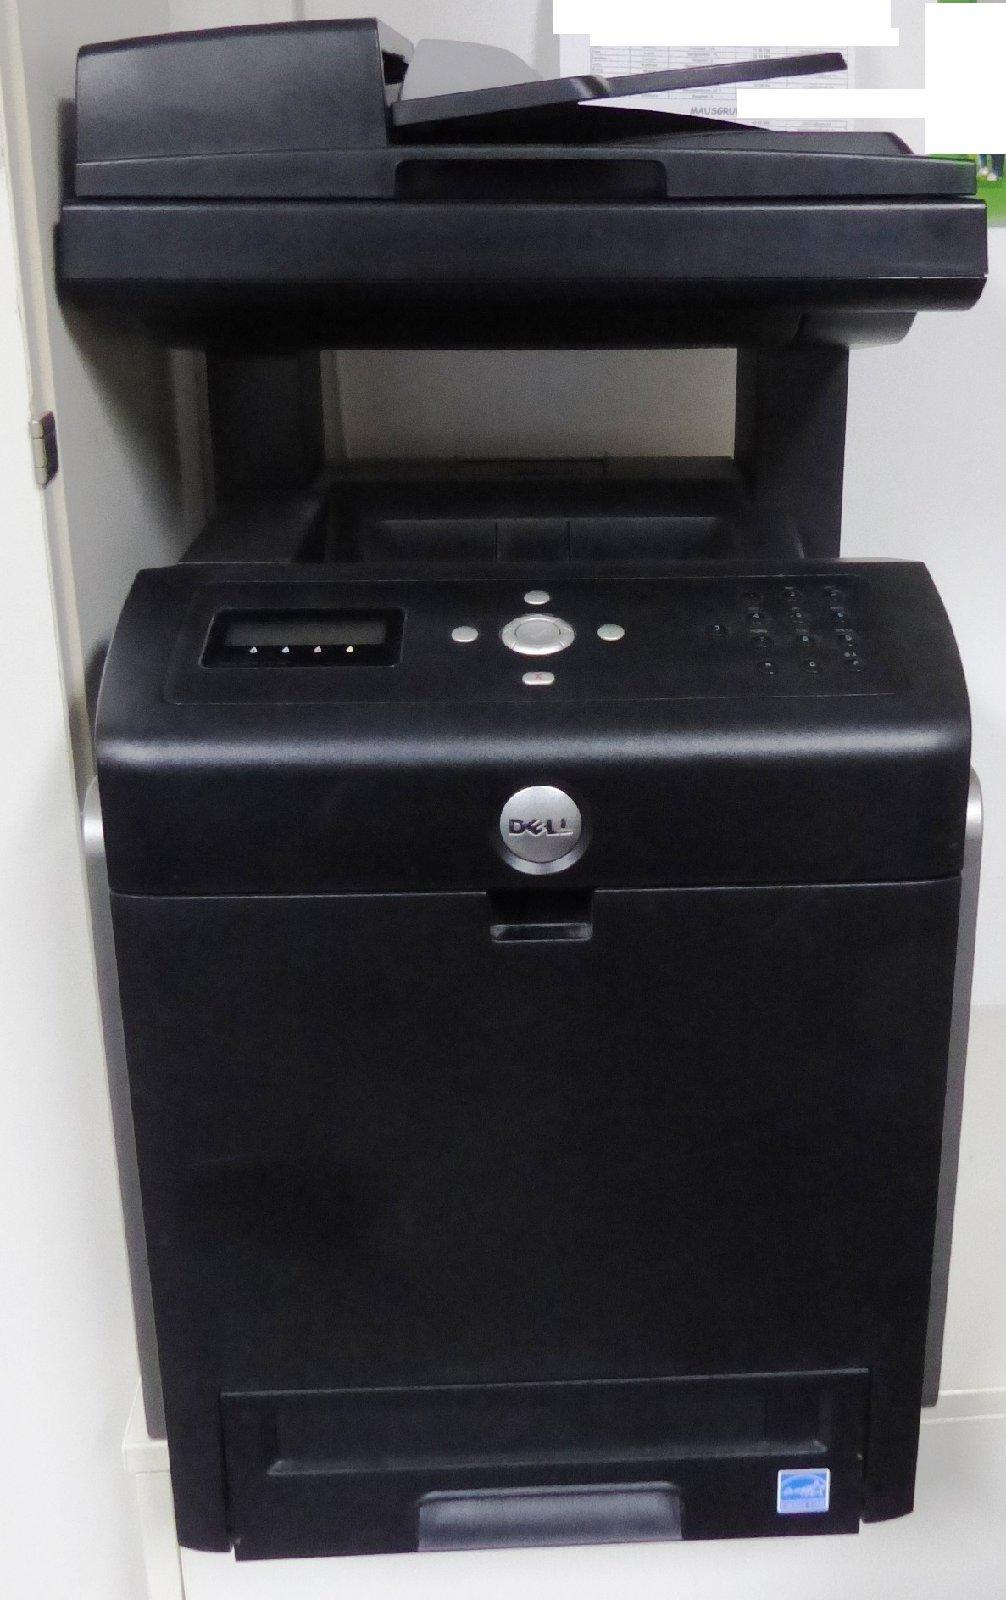 dell farblaserdrucker mfp 3115cn laserdrucker multifunktionsdrucker scanner. Black Bedroom Furniture Sets. Home Design Ideas